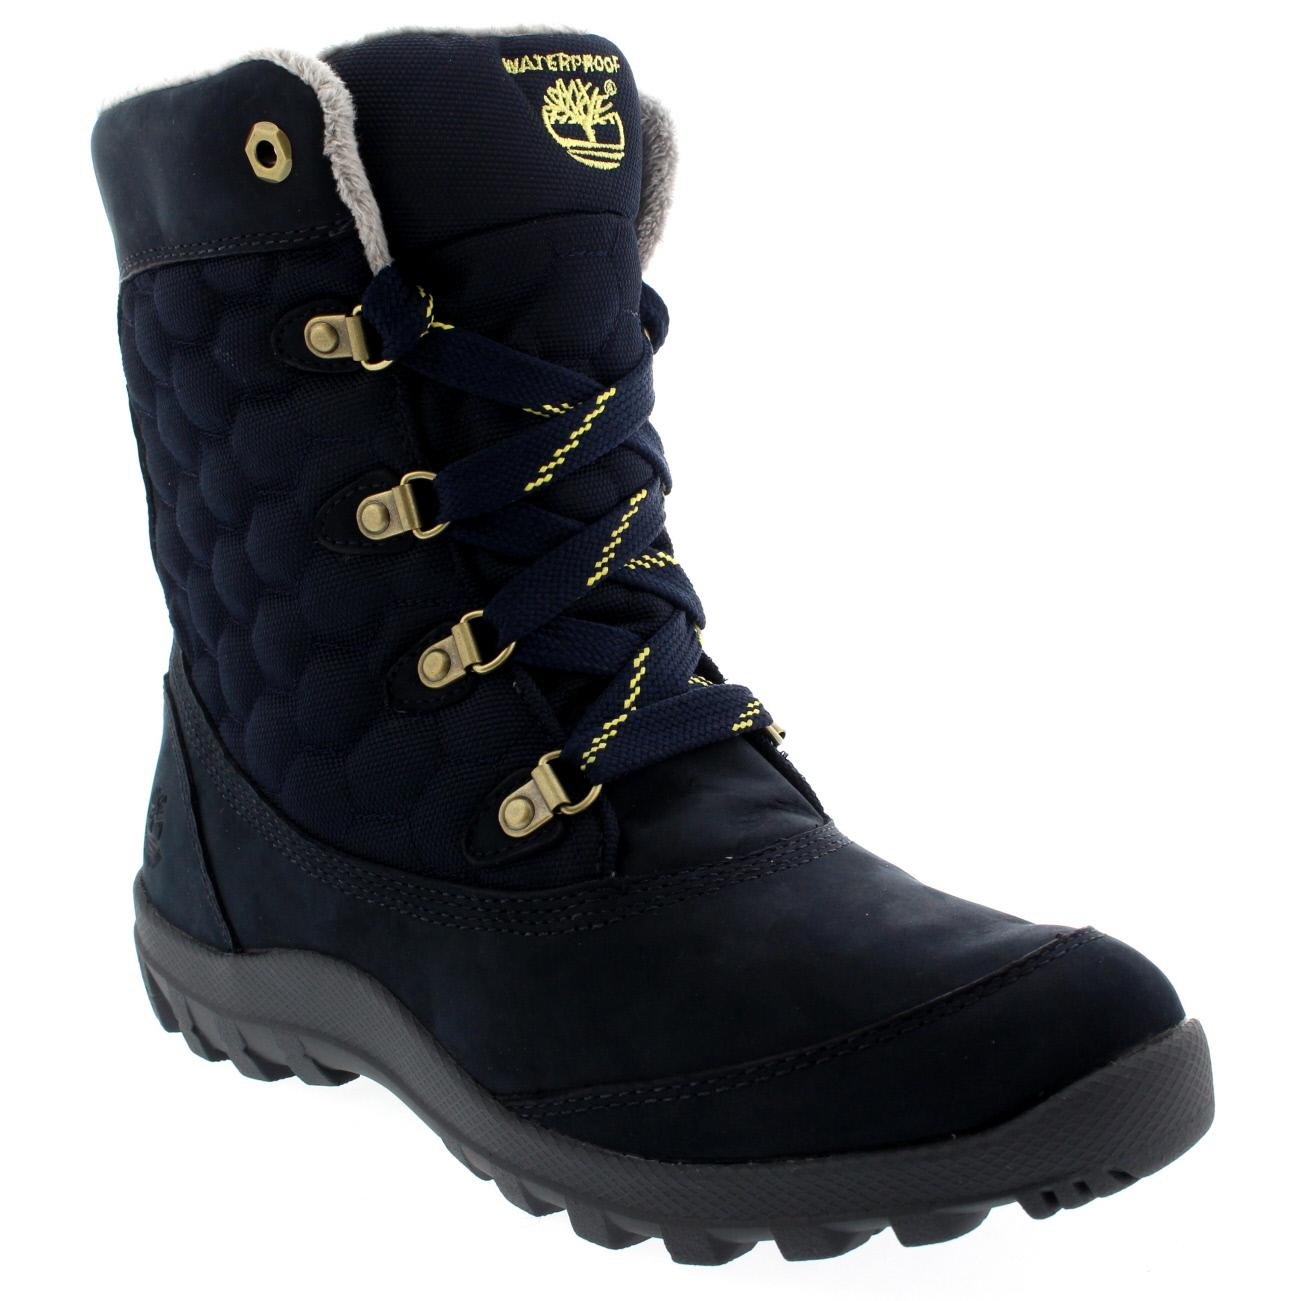 Unique Timberland Welfleet Wellie 6 IN Womenu0026#39;s Green Rain Boots | Shiekh Shoes